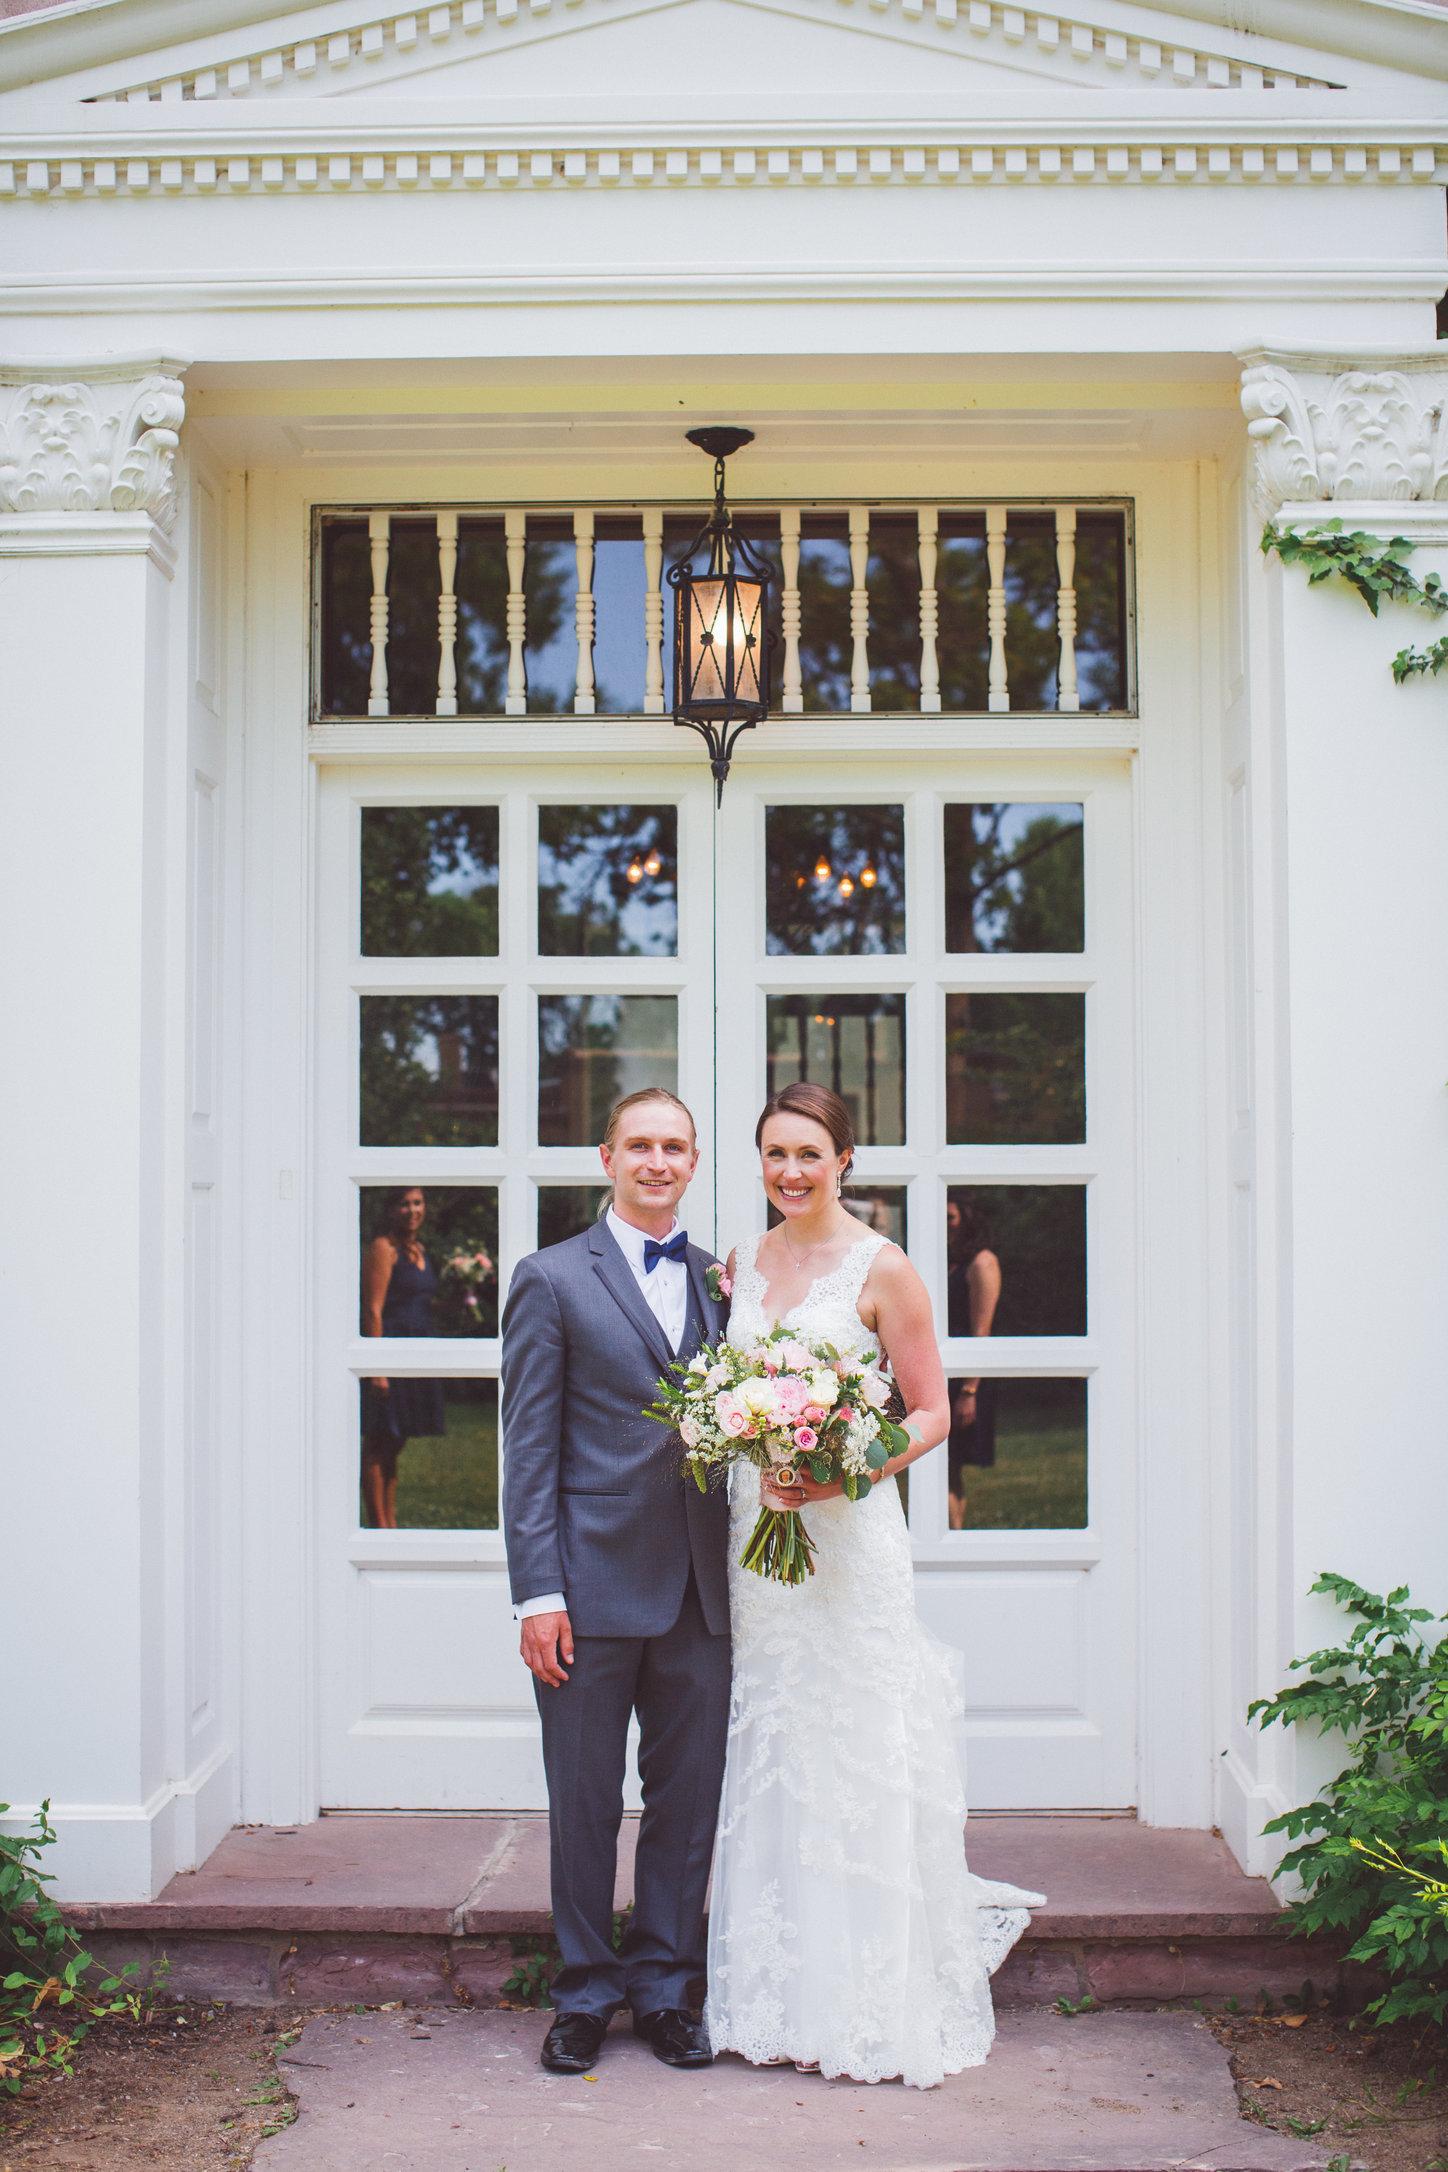 SandC-wedding-351.jpg